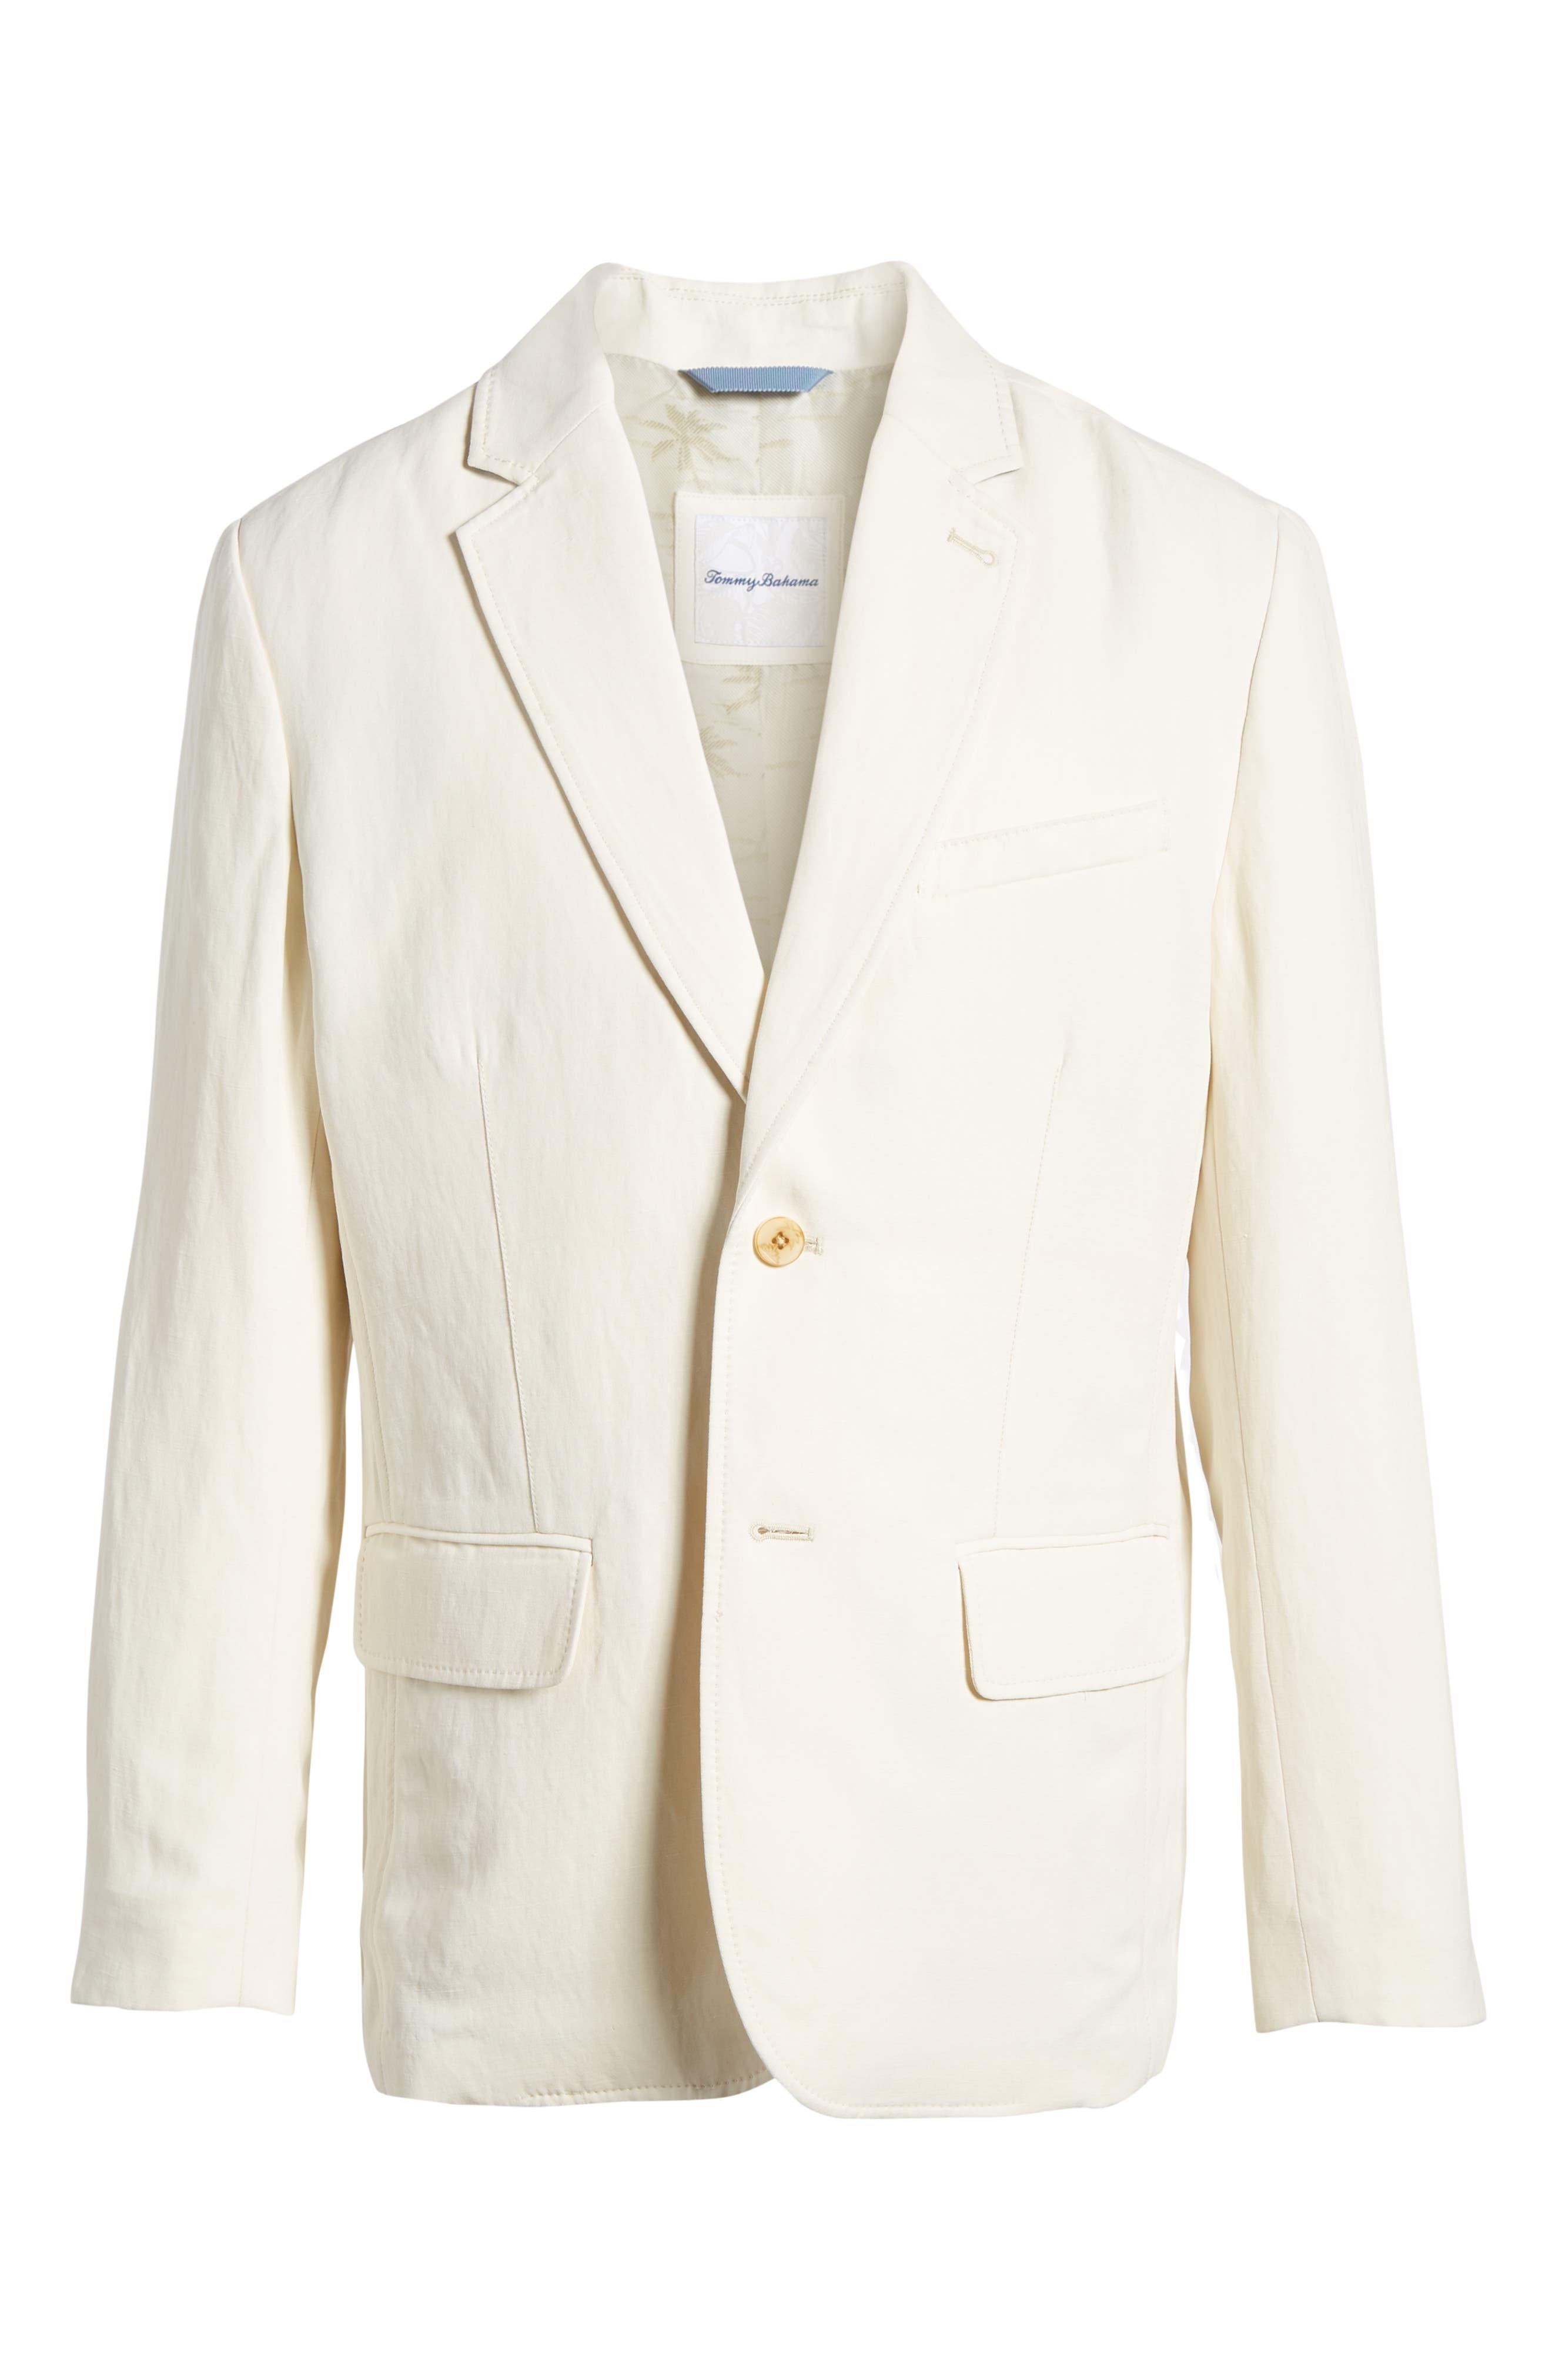 TOMMY BAHAMA,                             Monterey Silk & Linen Blazer,                             Alternate thumbnail 5, color,                             WARM SAND